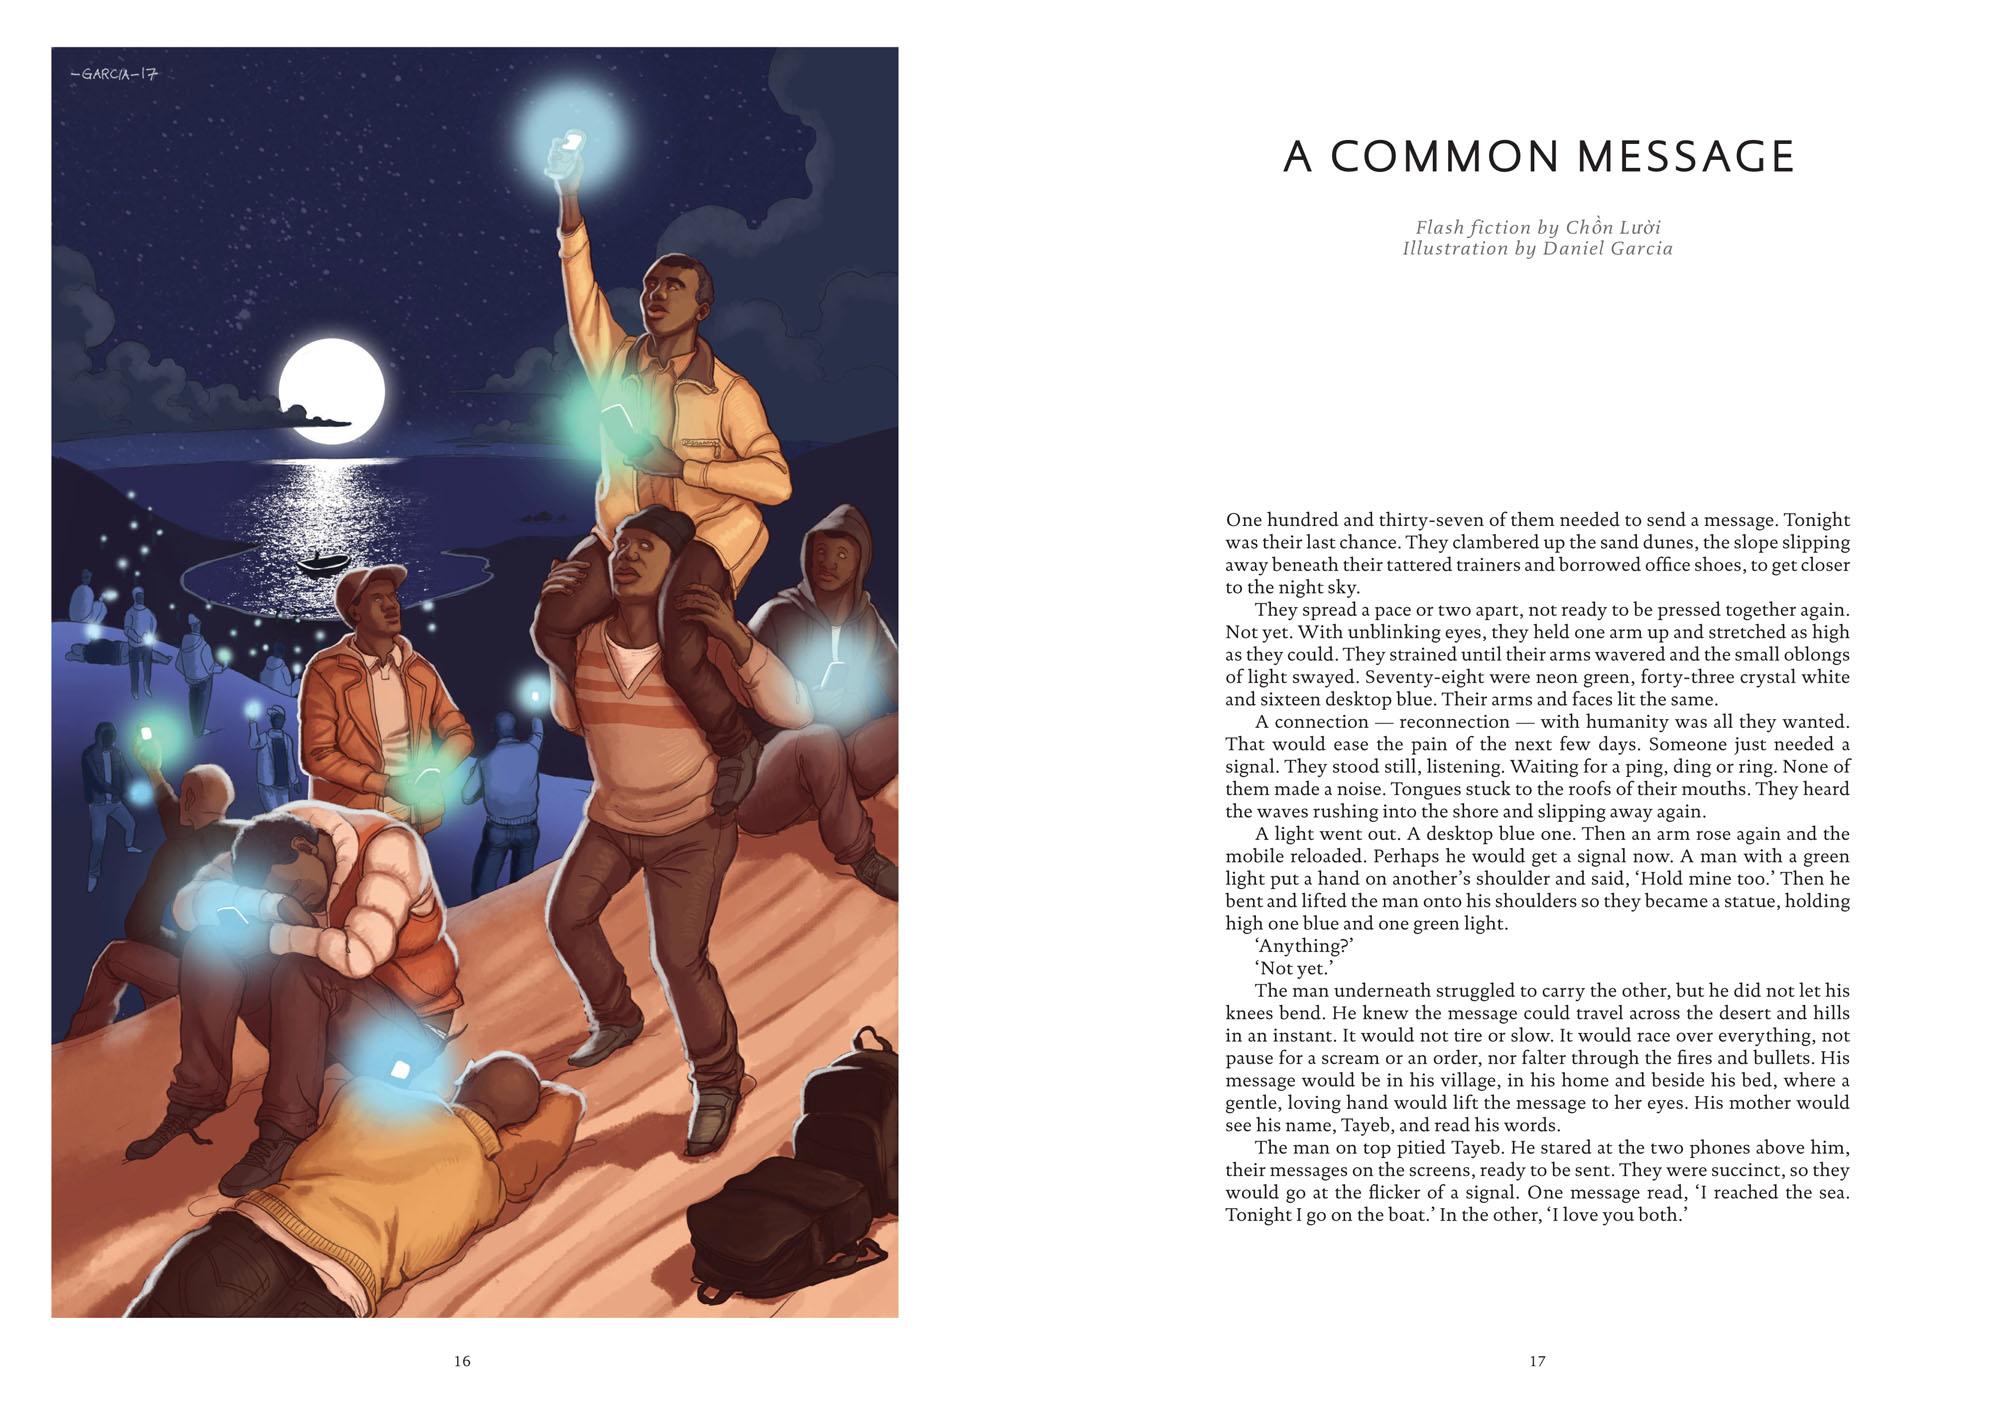 Daniel Garcia Art Illustration Editorial Popshot A Common Message Immigrants Refugees Desert Night Boats Mediterranean 02